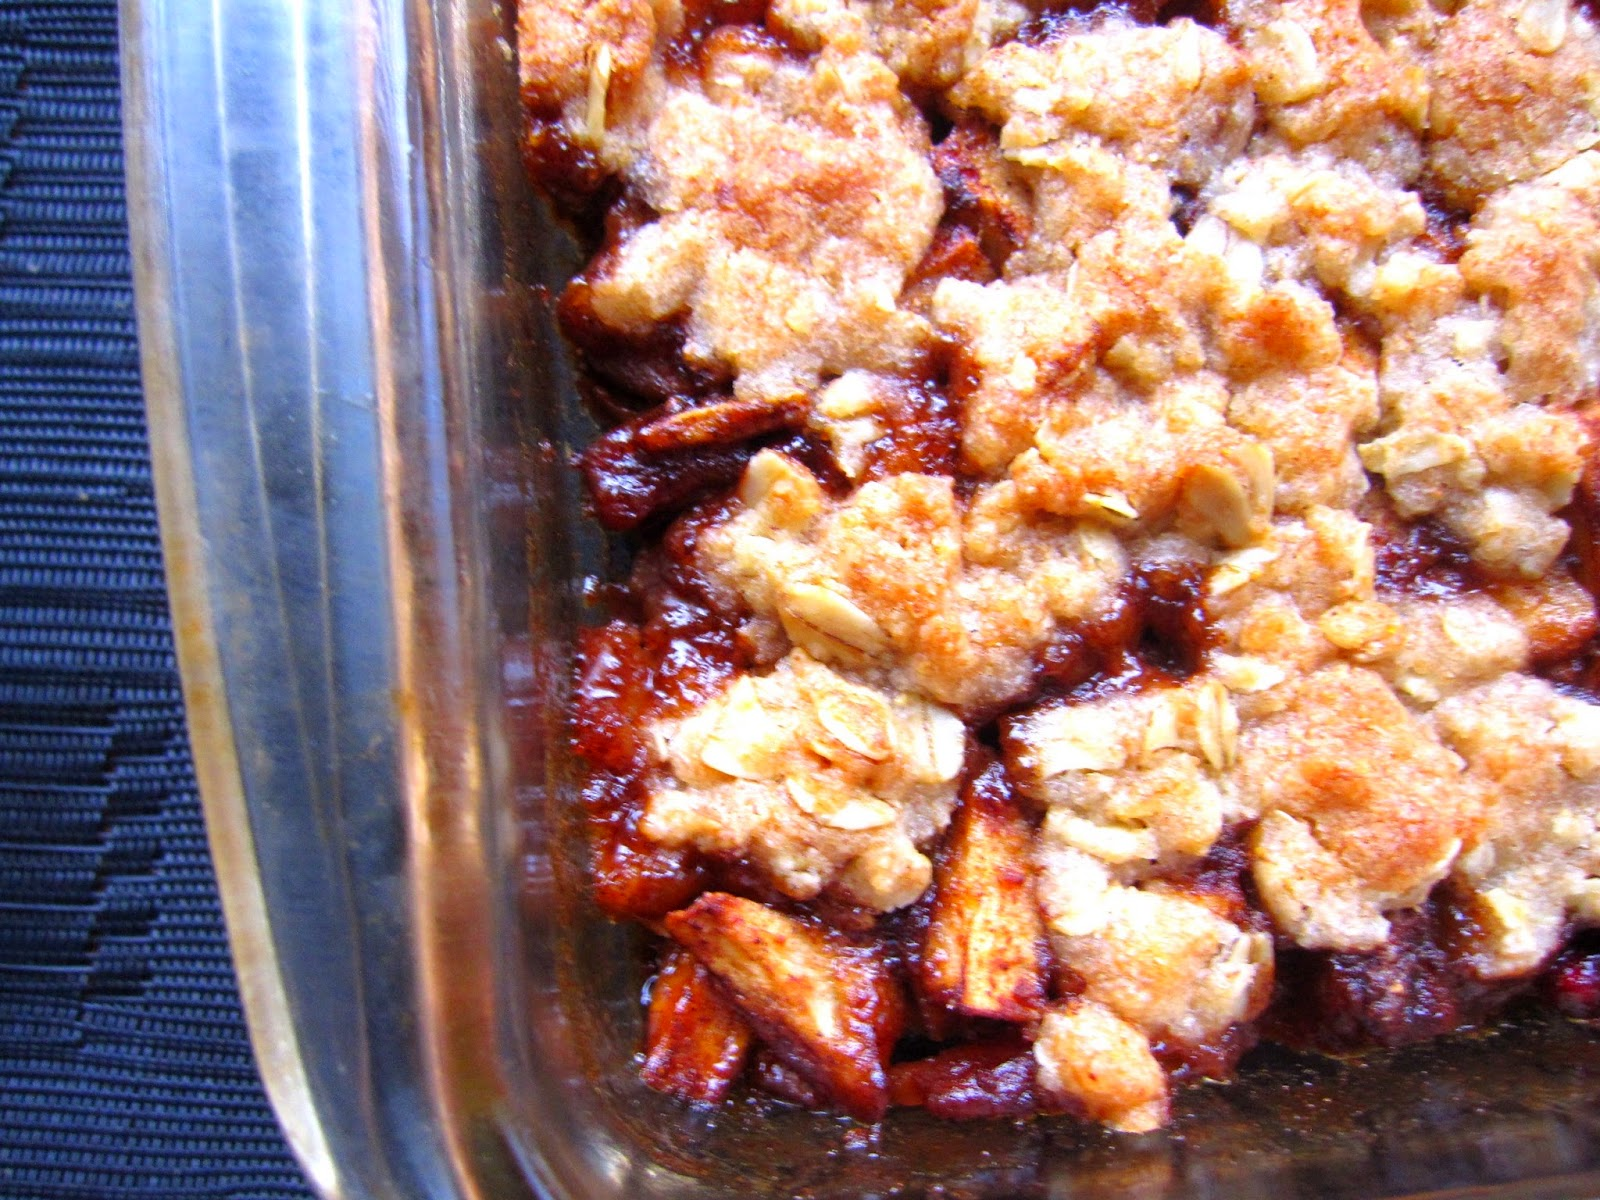 Pomegranate and Apple Crisp. Winter vegetarian dessert